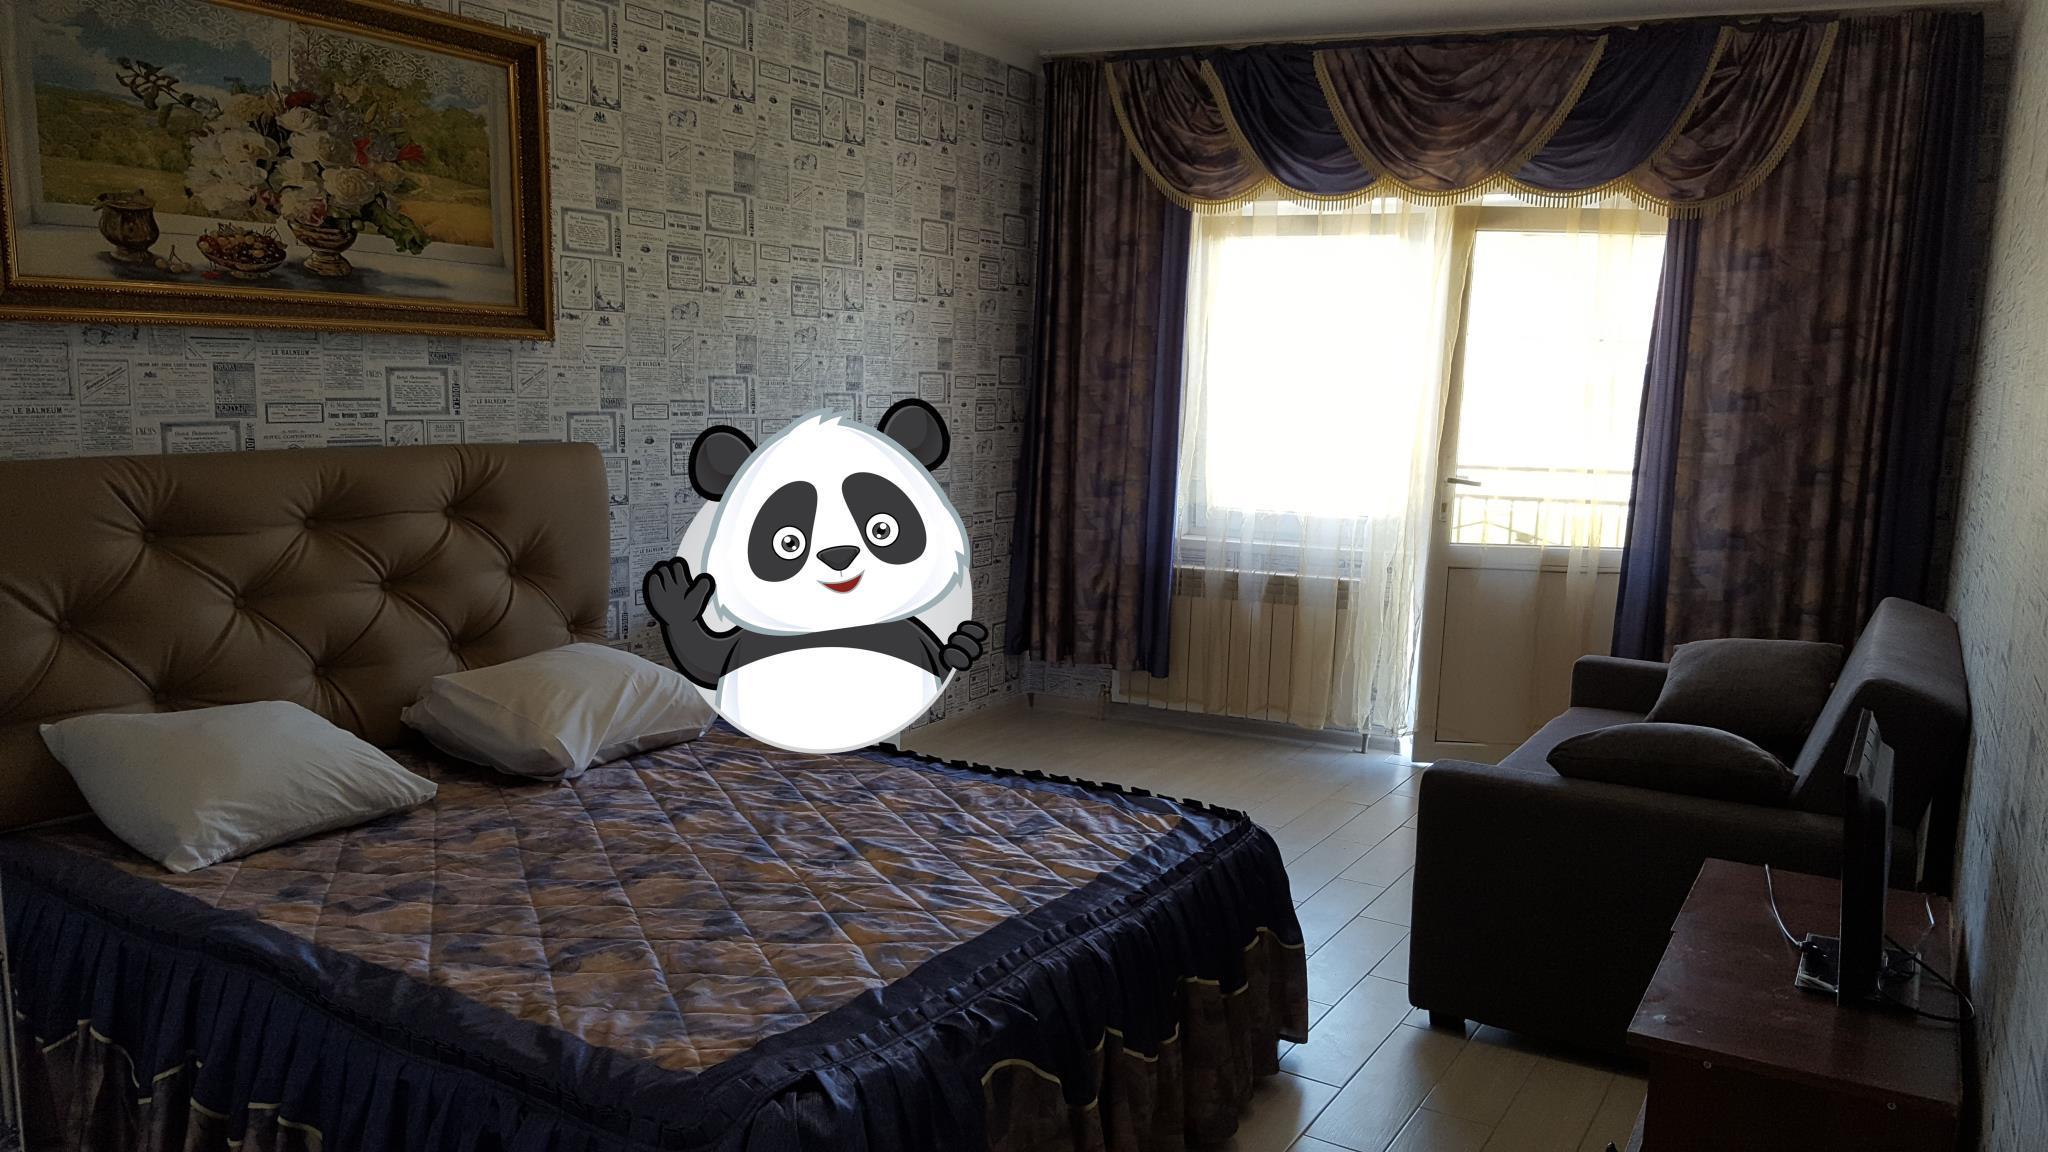 COMFORTABLE HOTEL PANDA IN OLYMPIC PARK